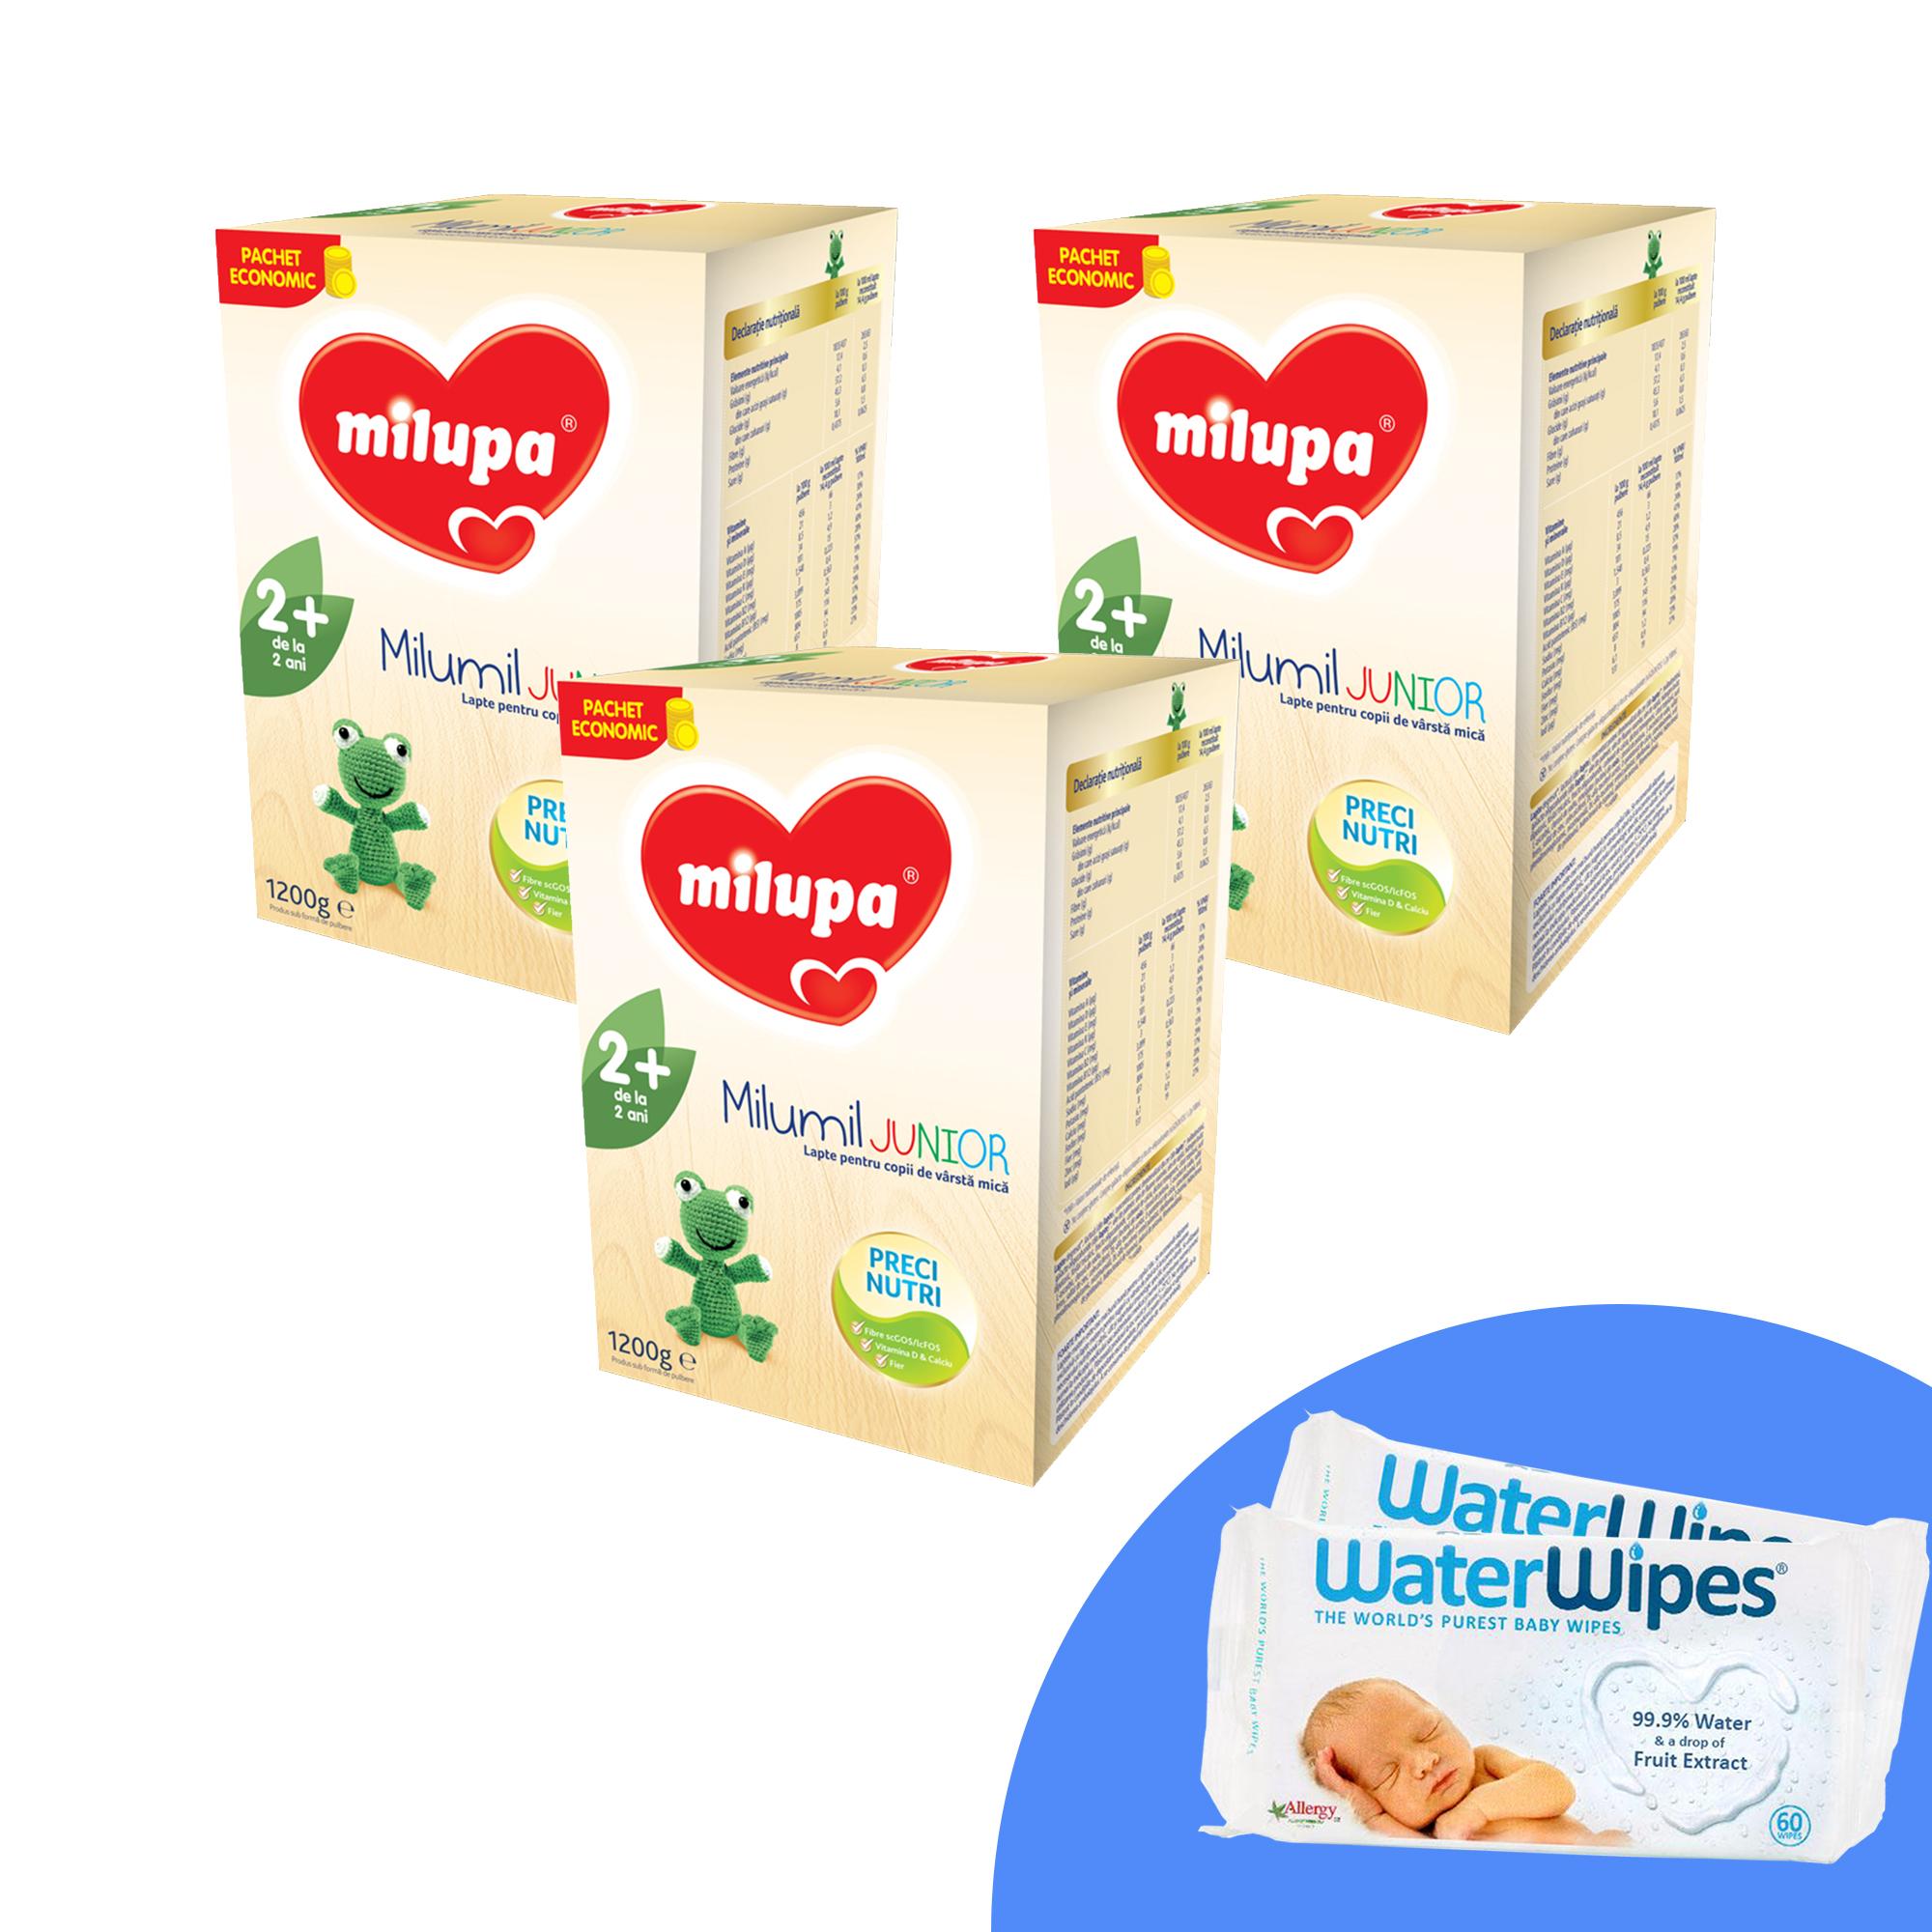 Pachet 3 x Lapte praf Milupa Milumil Junior 2+, 1200g, 2ani+ si 2 x Servetele umede pentru bebelusi, WaterWipes, 60 buc